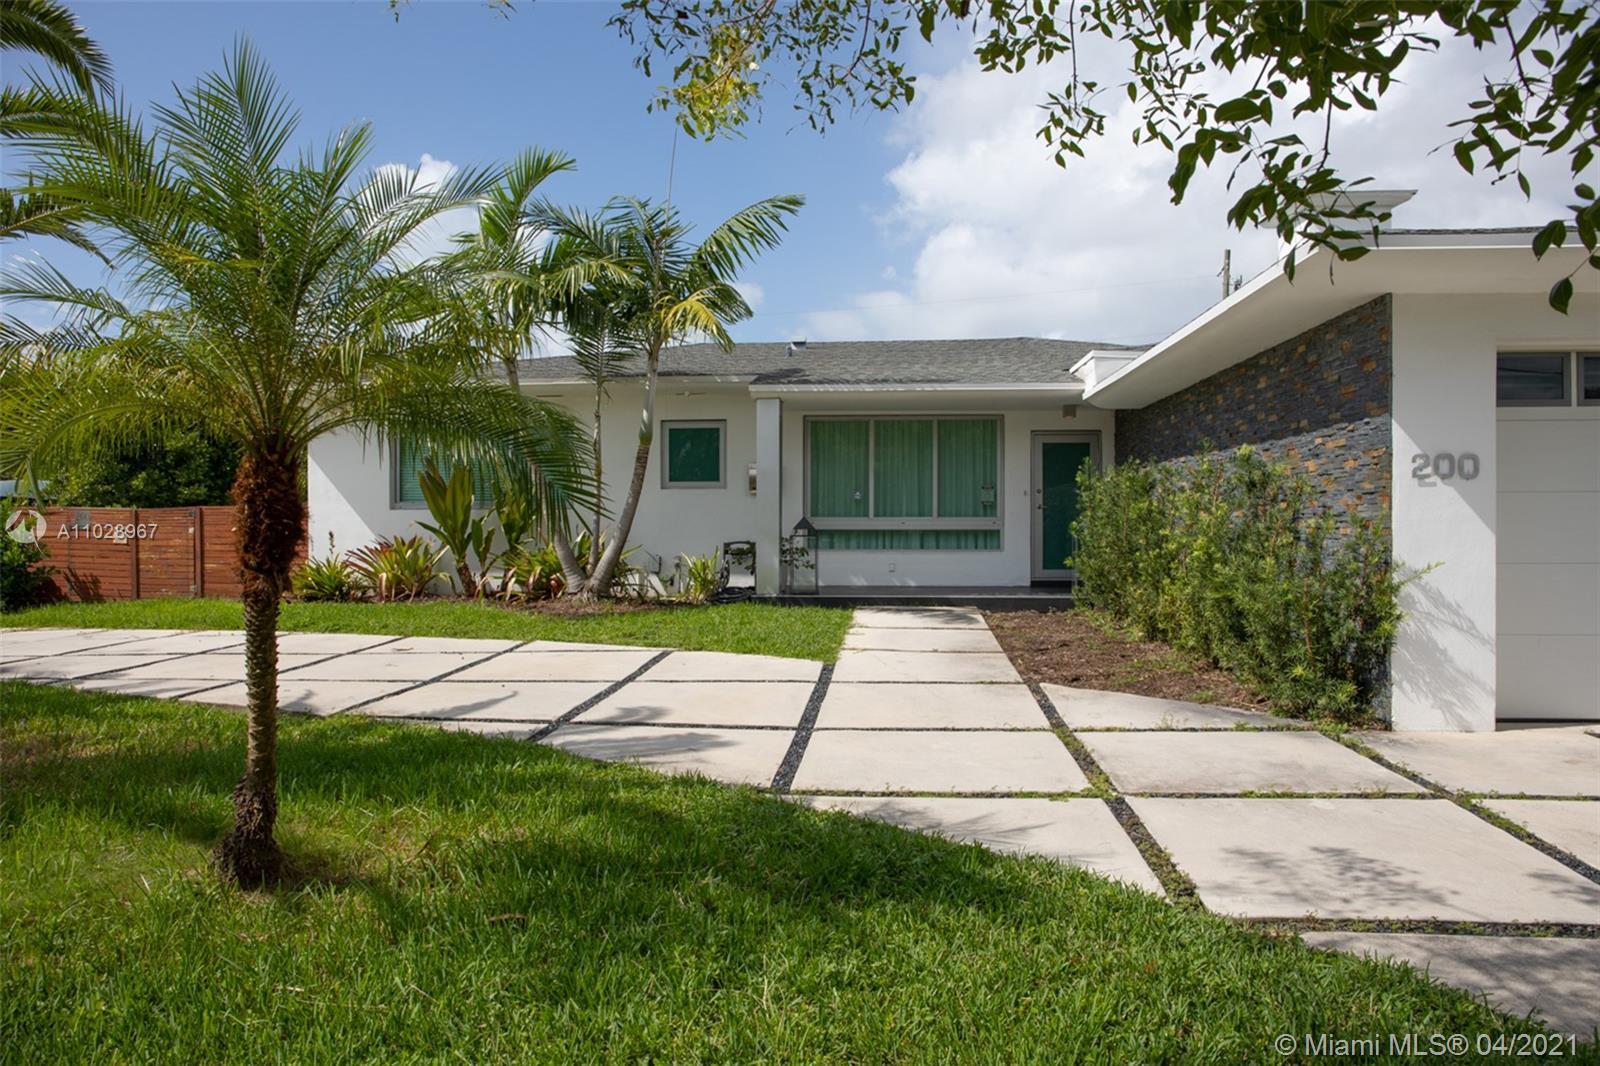 Isle of Normandy - 200 N Shore Dr, Miami Beach, FL 33141